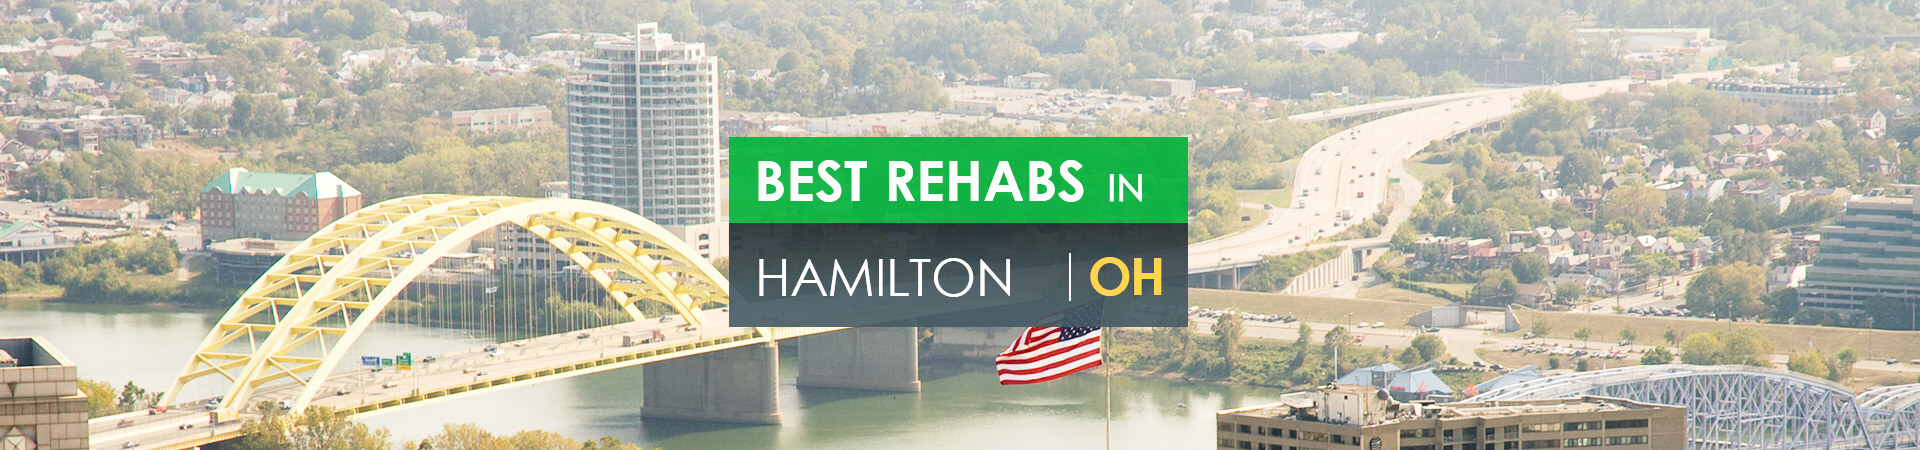 Best rehabs in Hamilton, OH